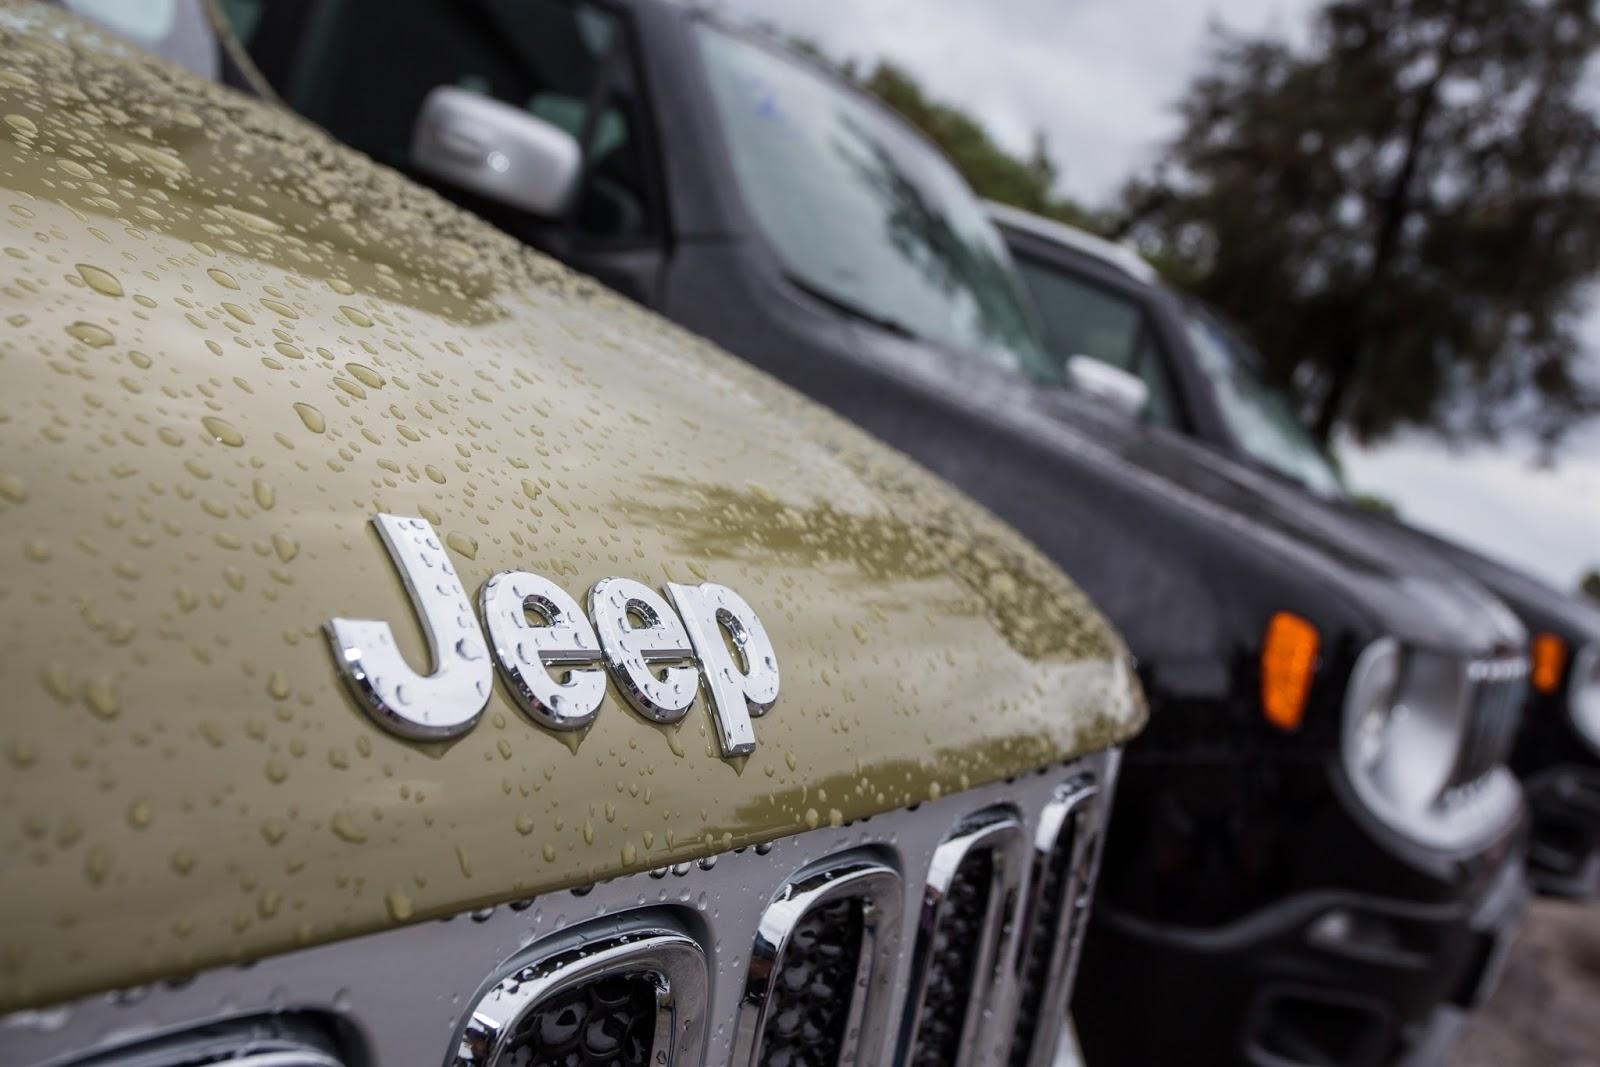 JEEP%2BCAMP U0B0996 Πετάμε ένα Jeep Renegade σε λάσπες, πέτρες, άμμο, λίμνες. Θα τα καταφέρει;